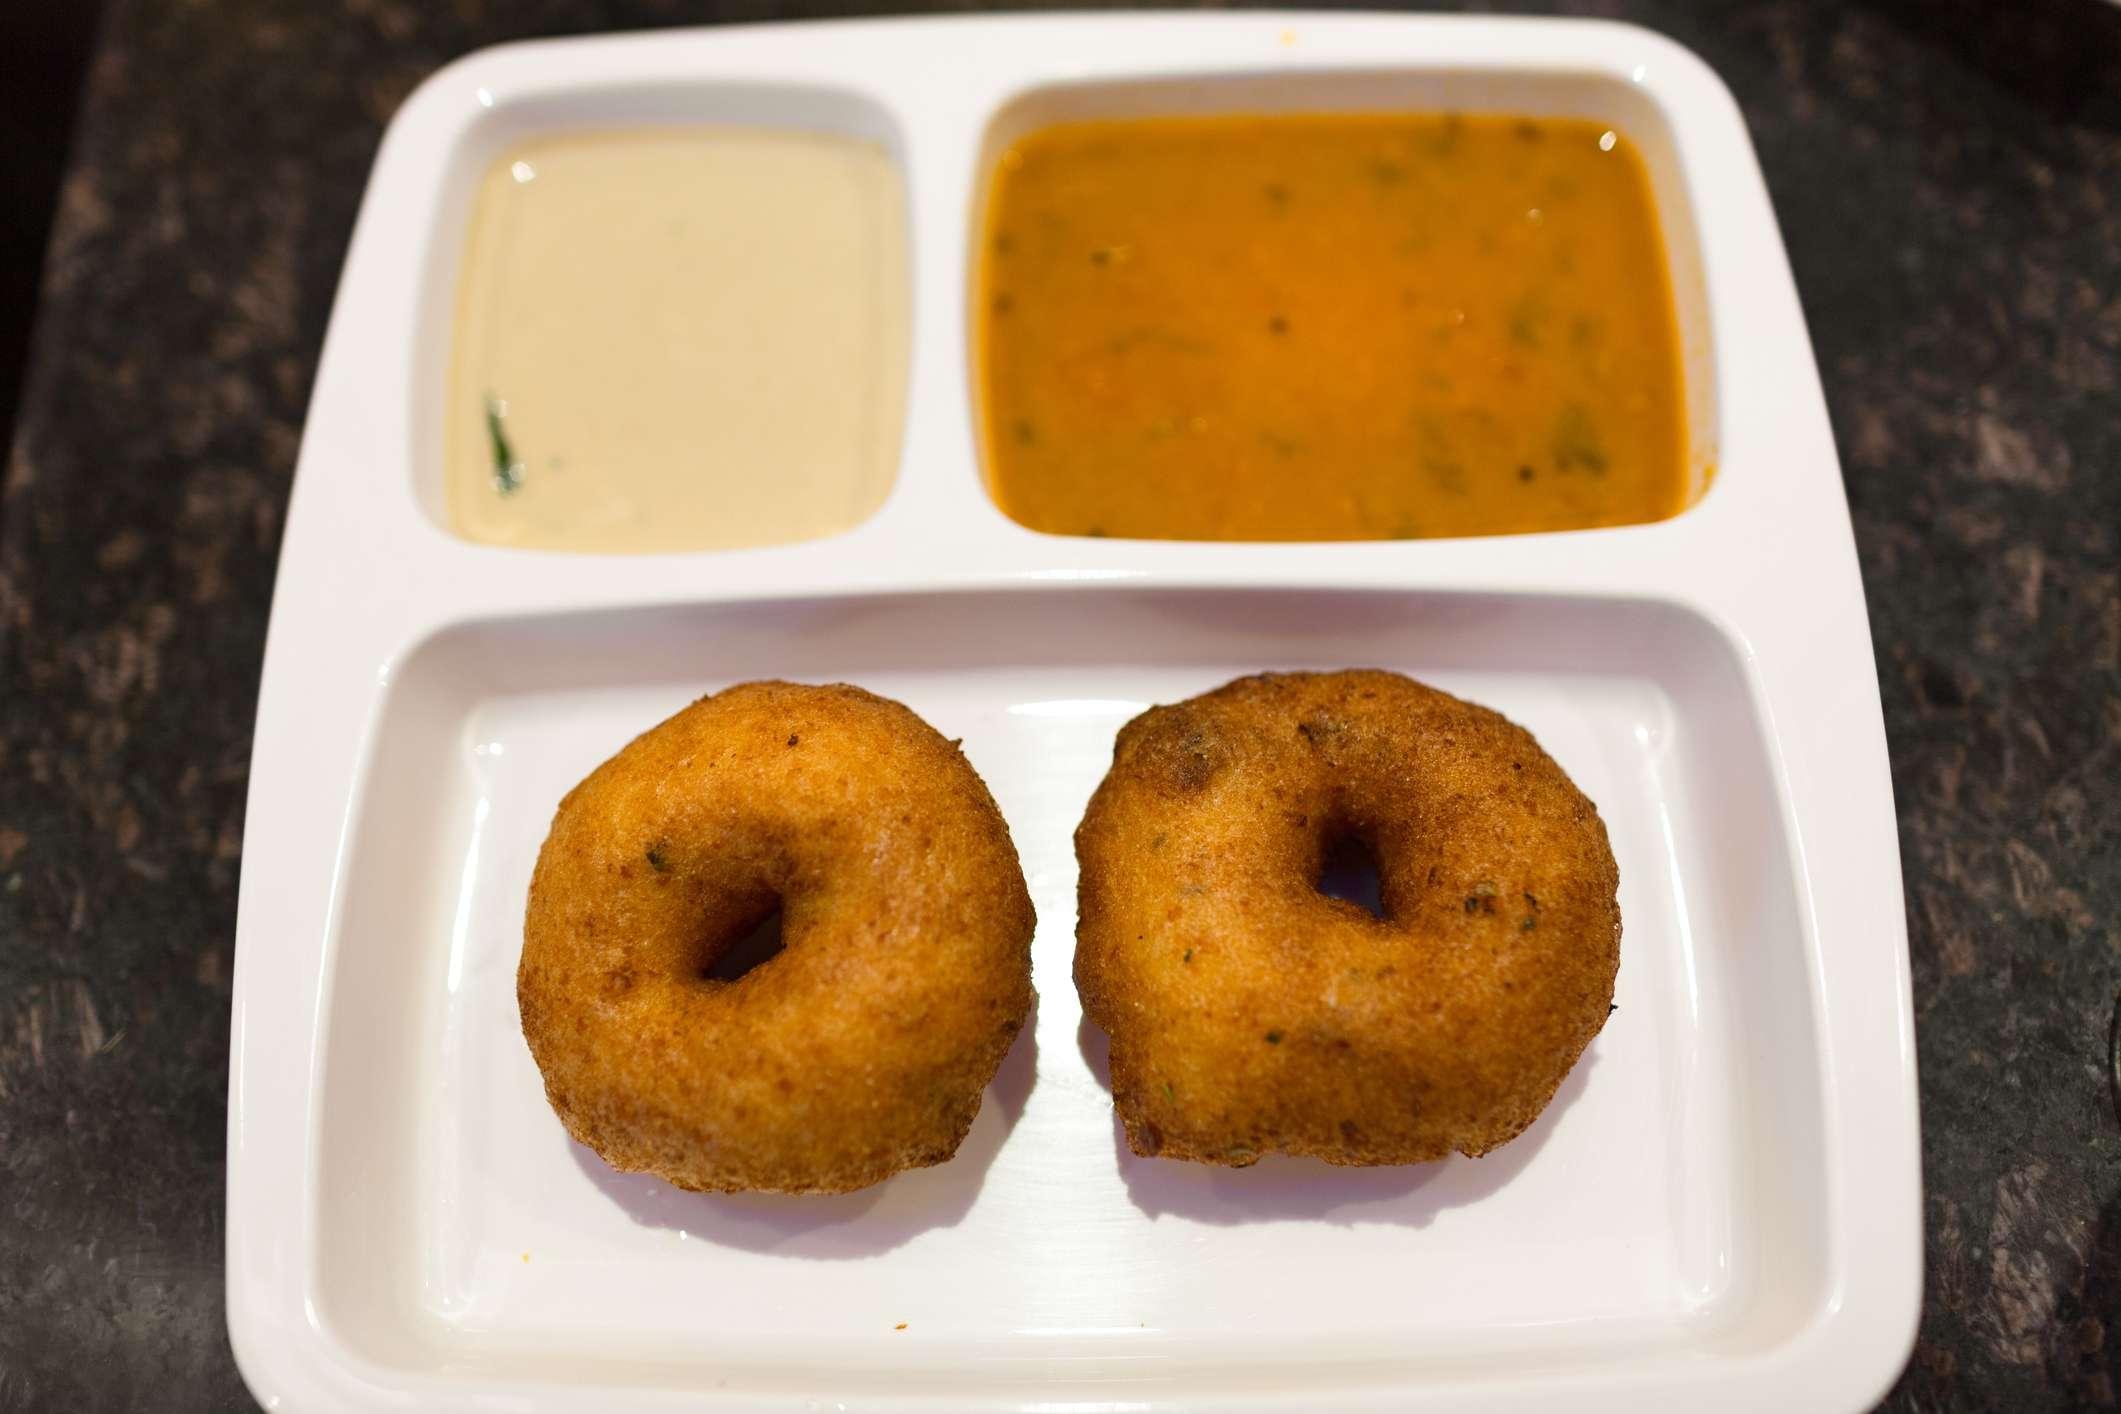 crispy south indian vada served with chutney and sambar